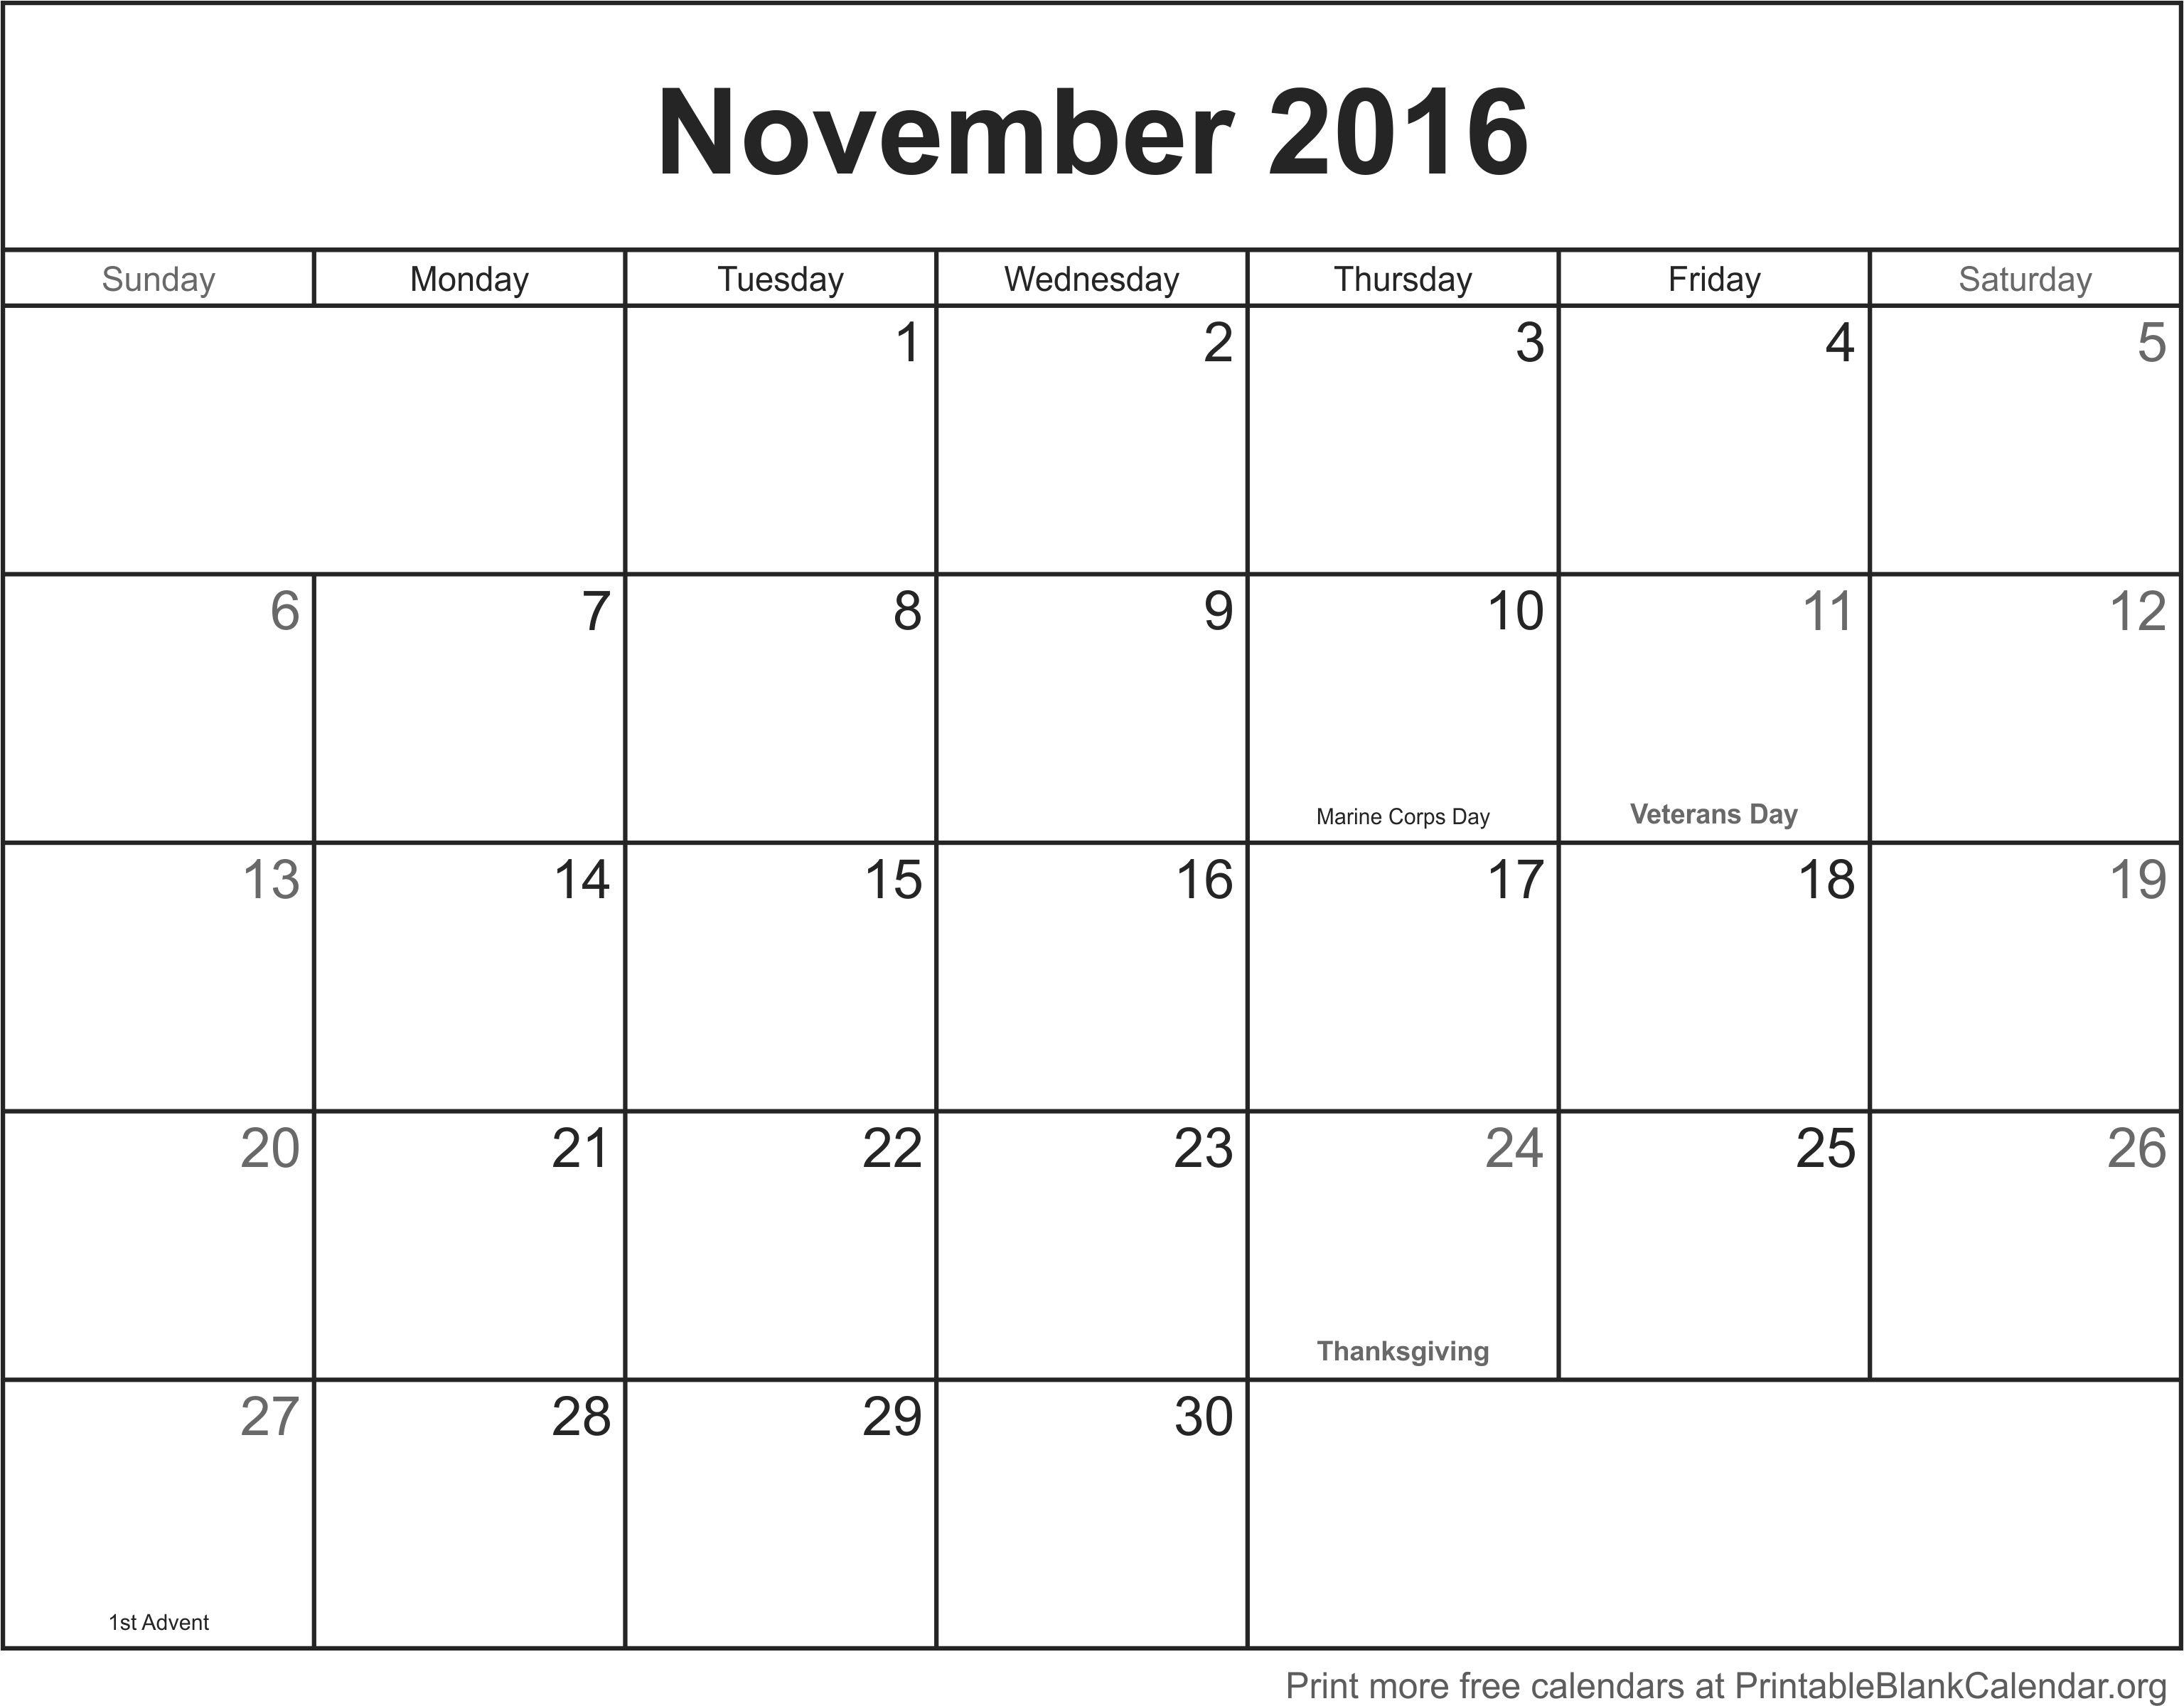 031 November Printable Calendar Template Incredible 2016 pertaining to June 2016 Calendar Printable